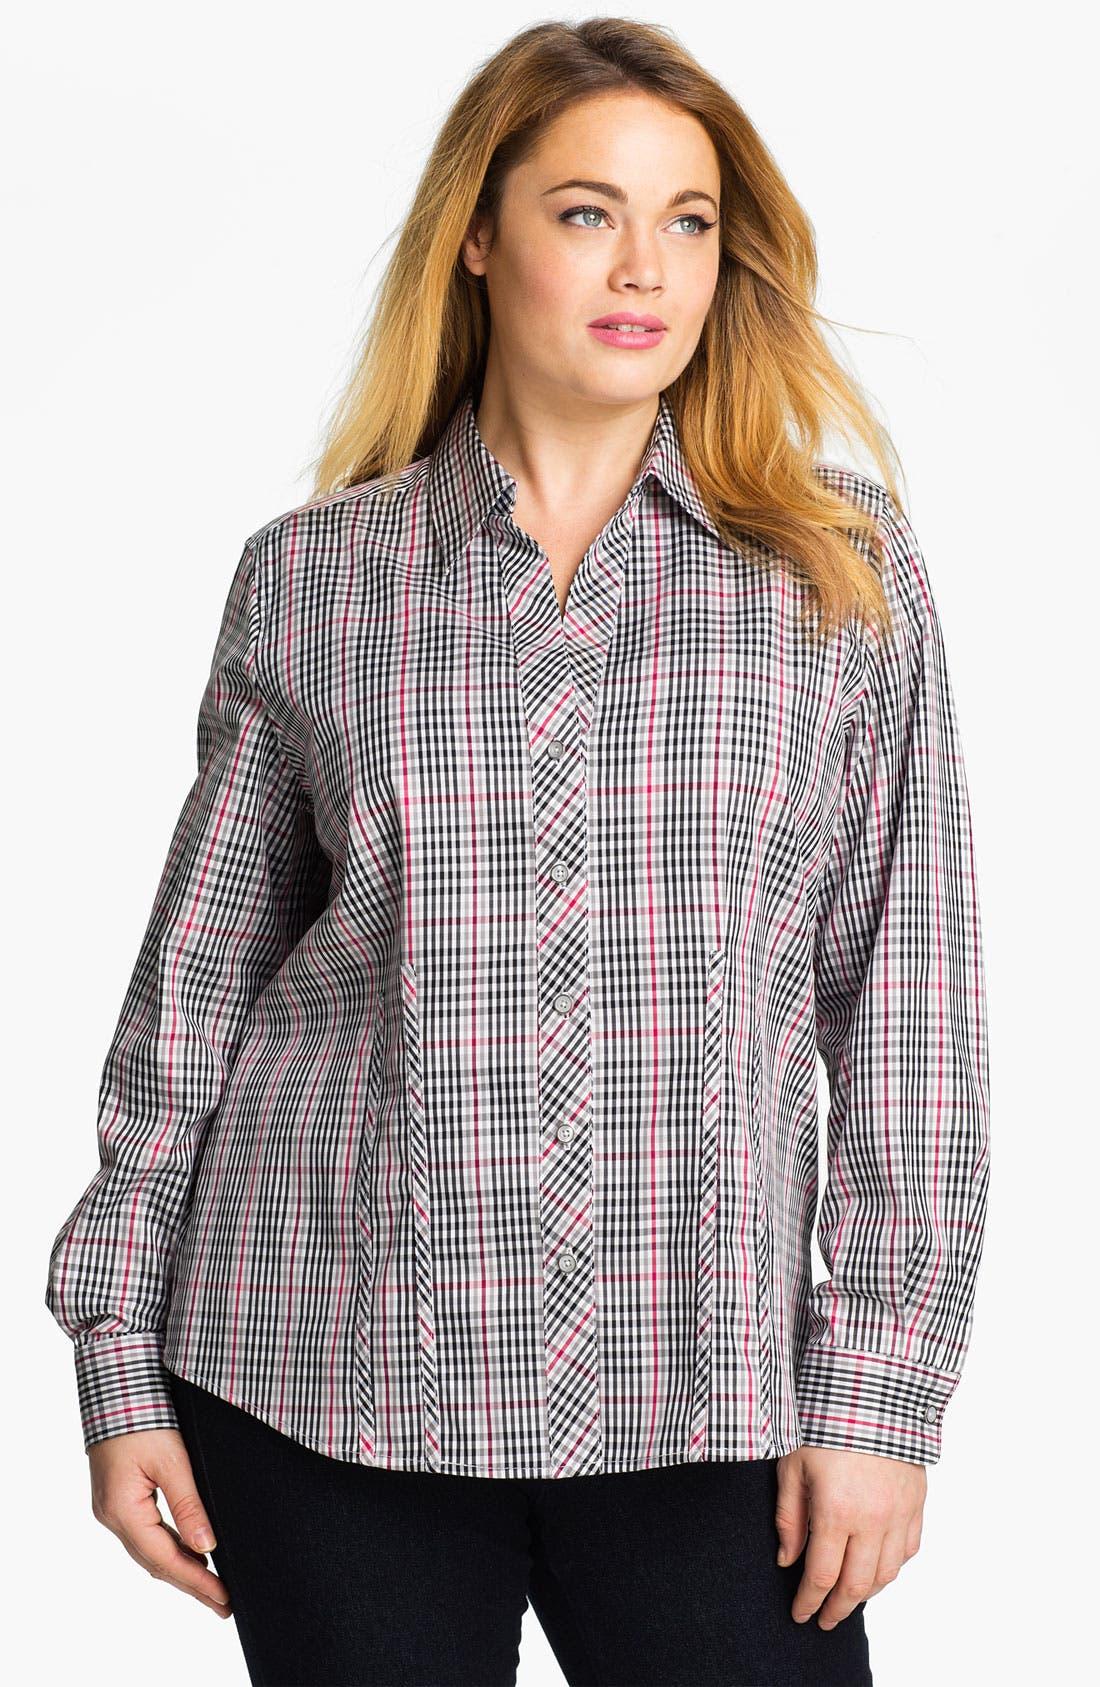 Alternate Image 1 Selected - Foxcroft 'Holiday Check' Wrinkle Free Shaped Shirt (Plus)